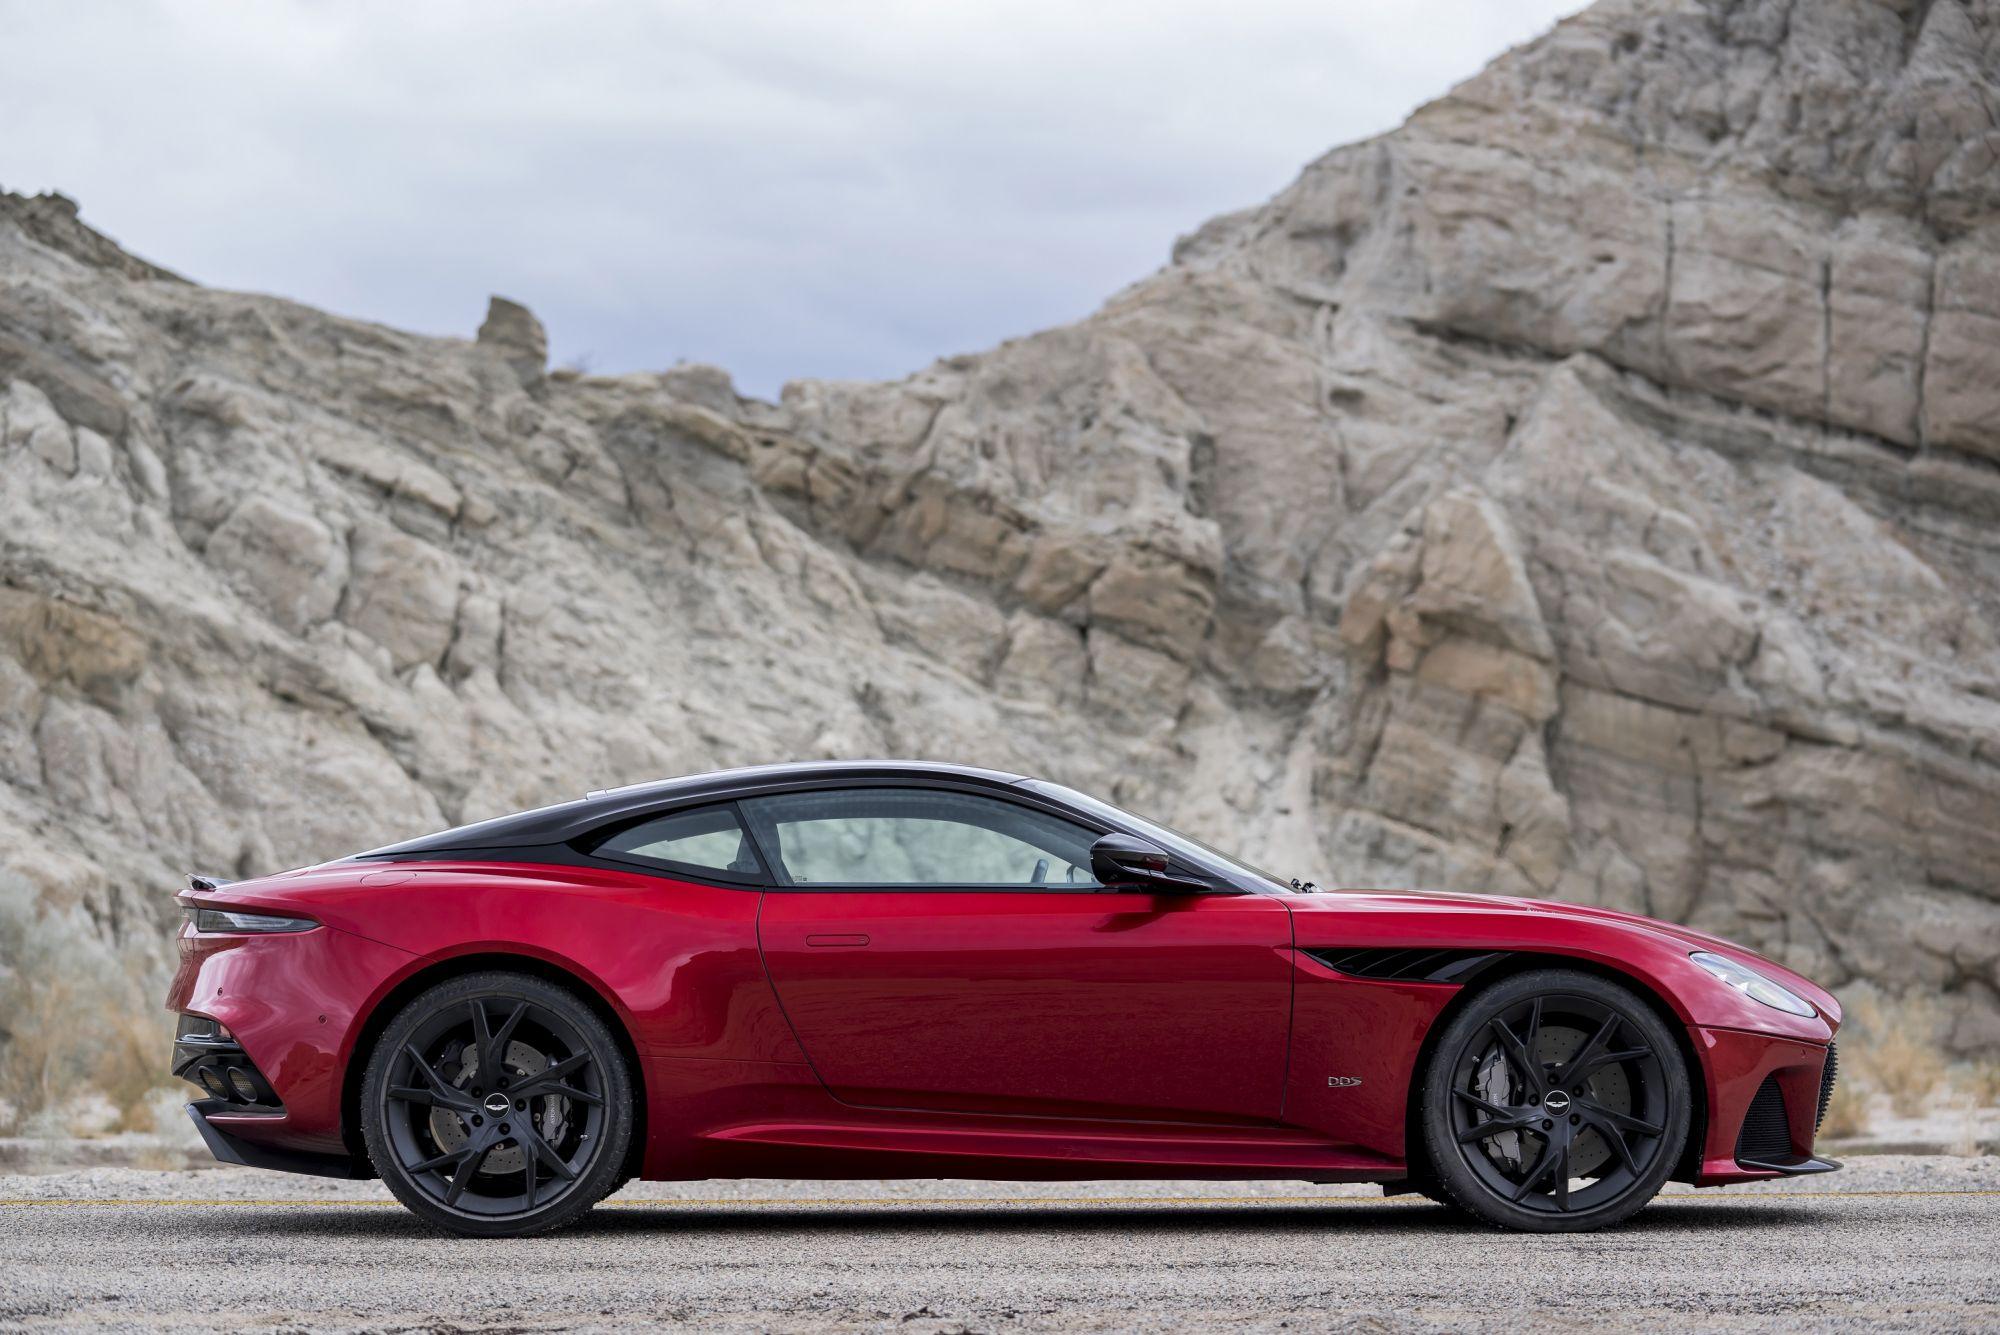 The Aston Martin DBS Superleggera Launches In Hong Kong